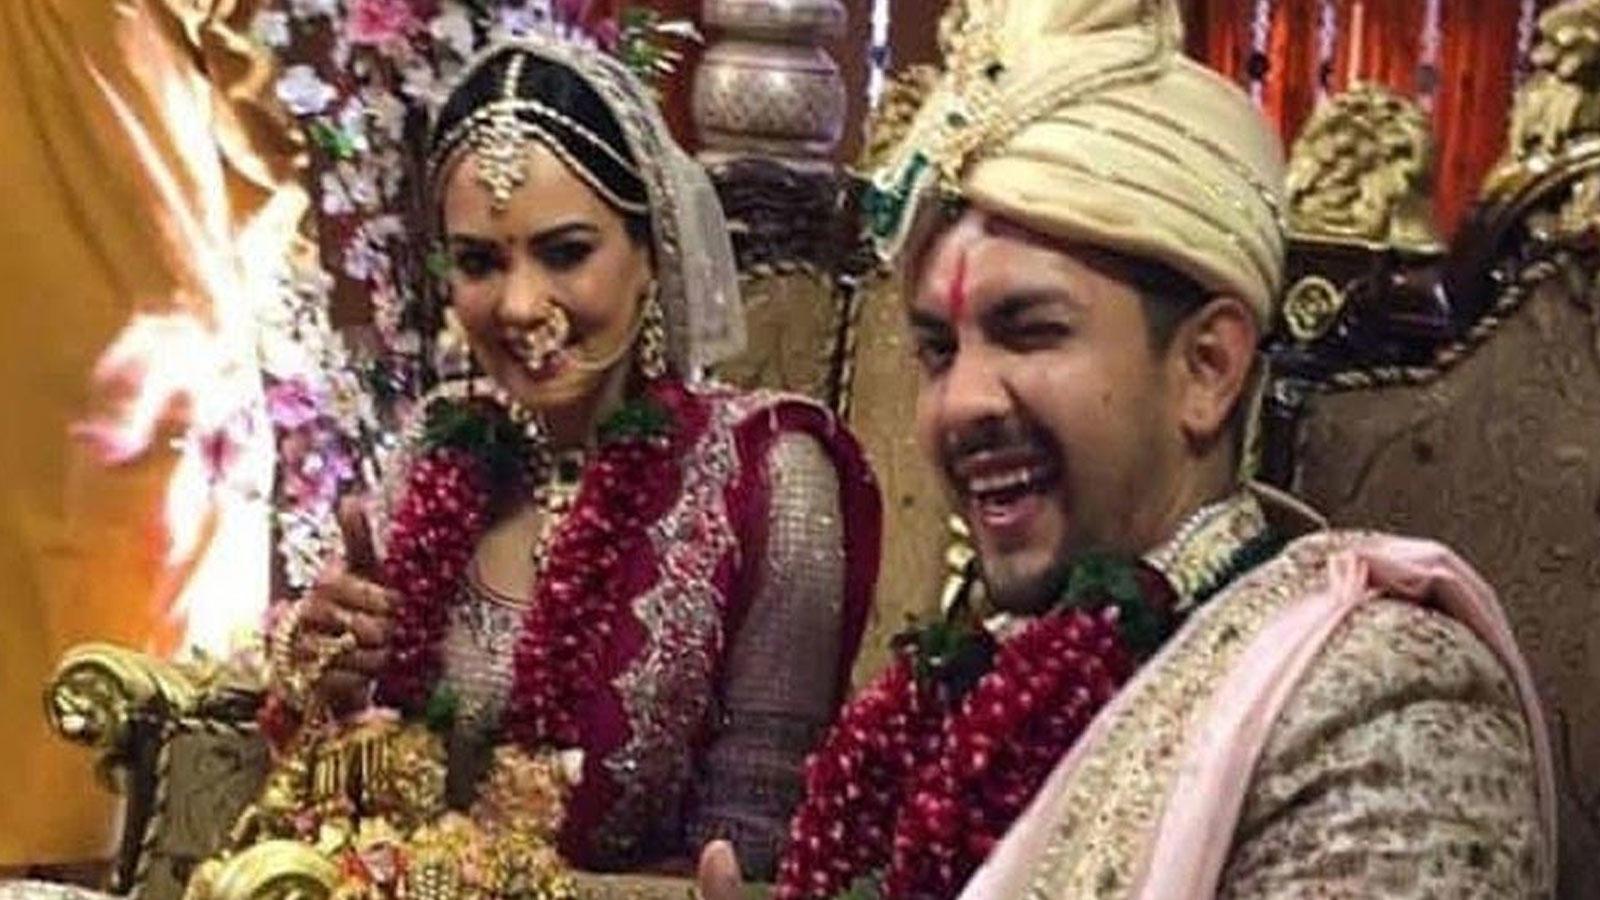 aditya-narayan-reveals-he-had-a-wardrobe-malfunction-during-his-wedding